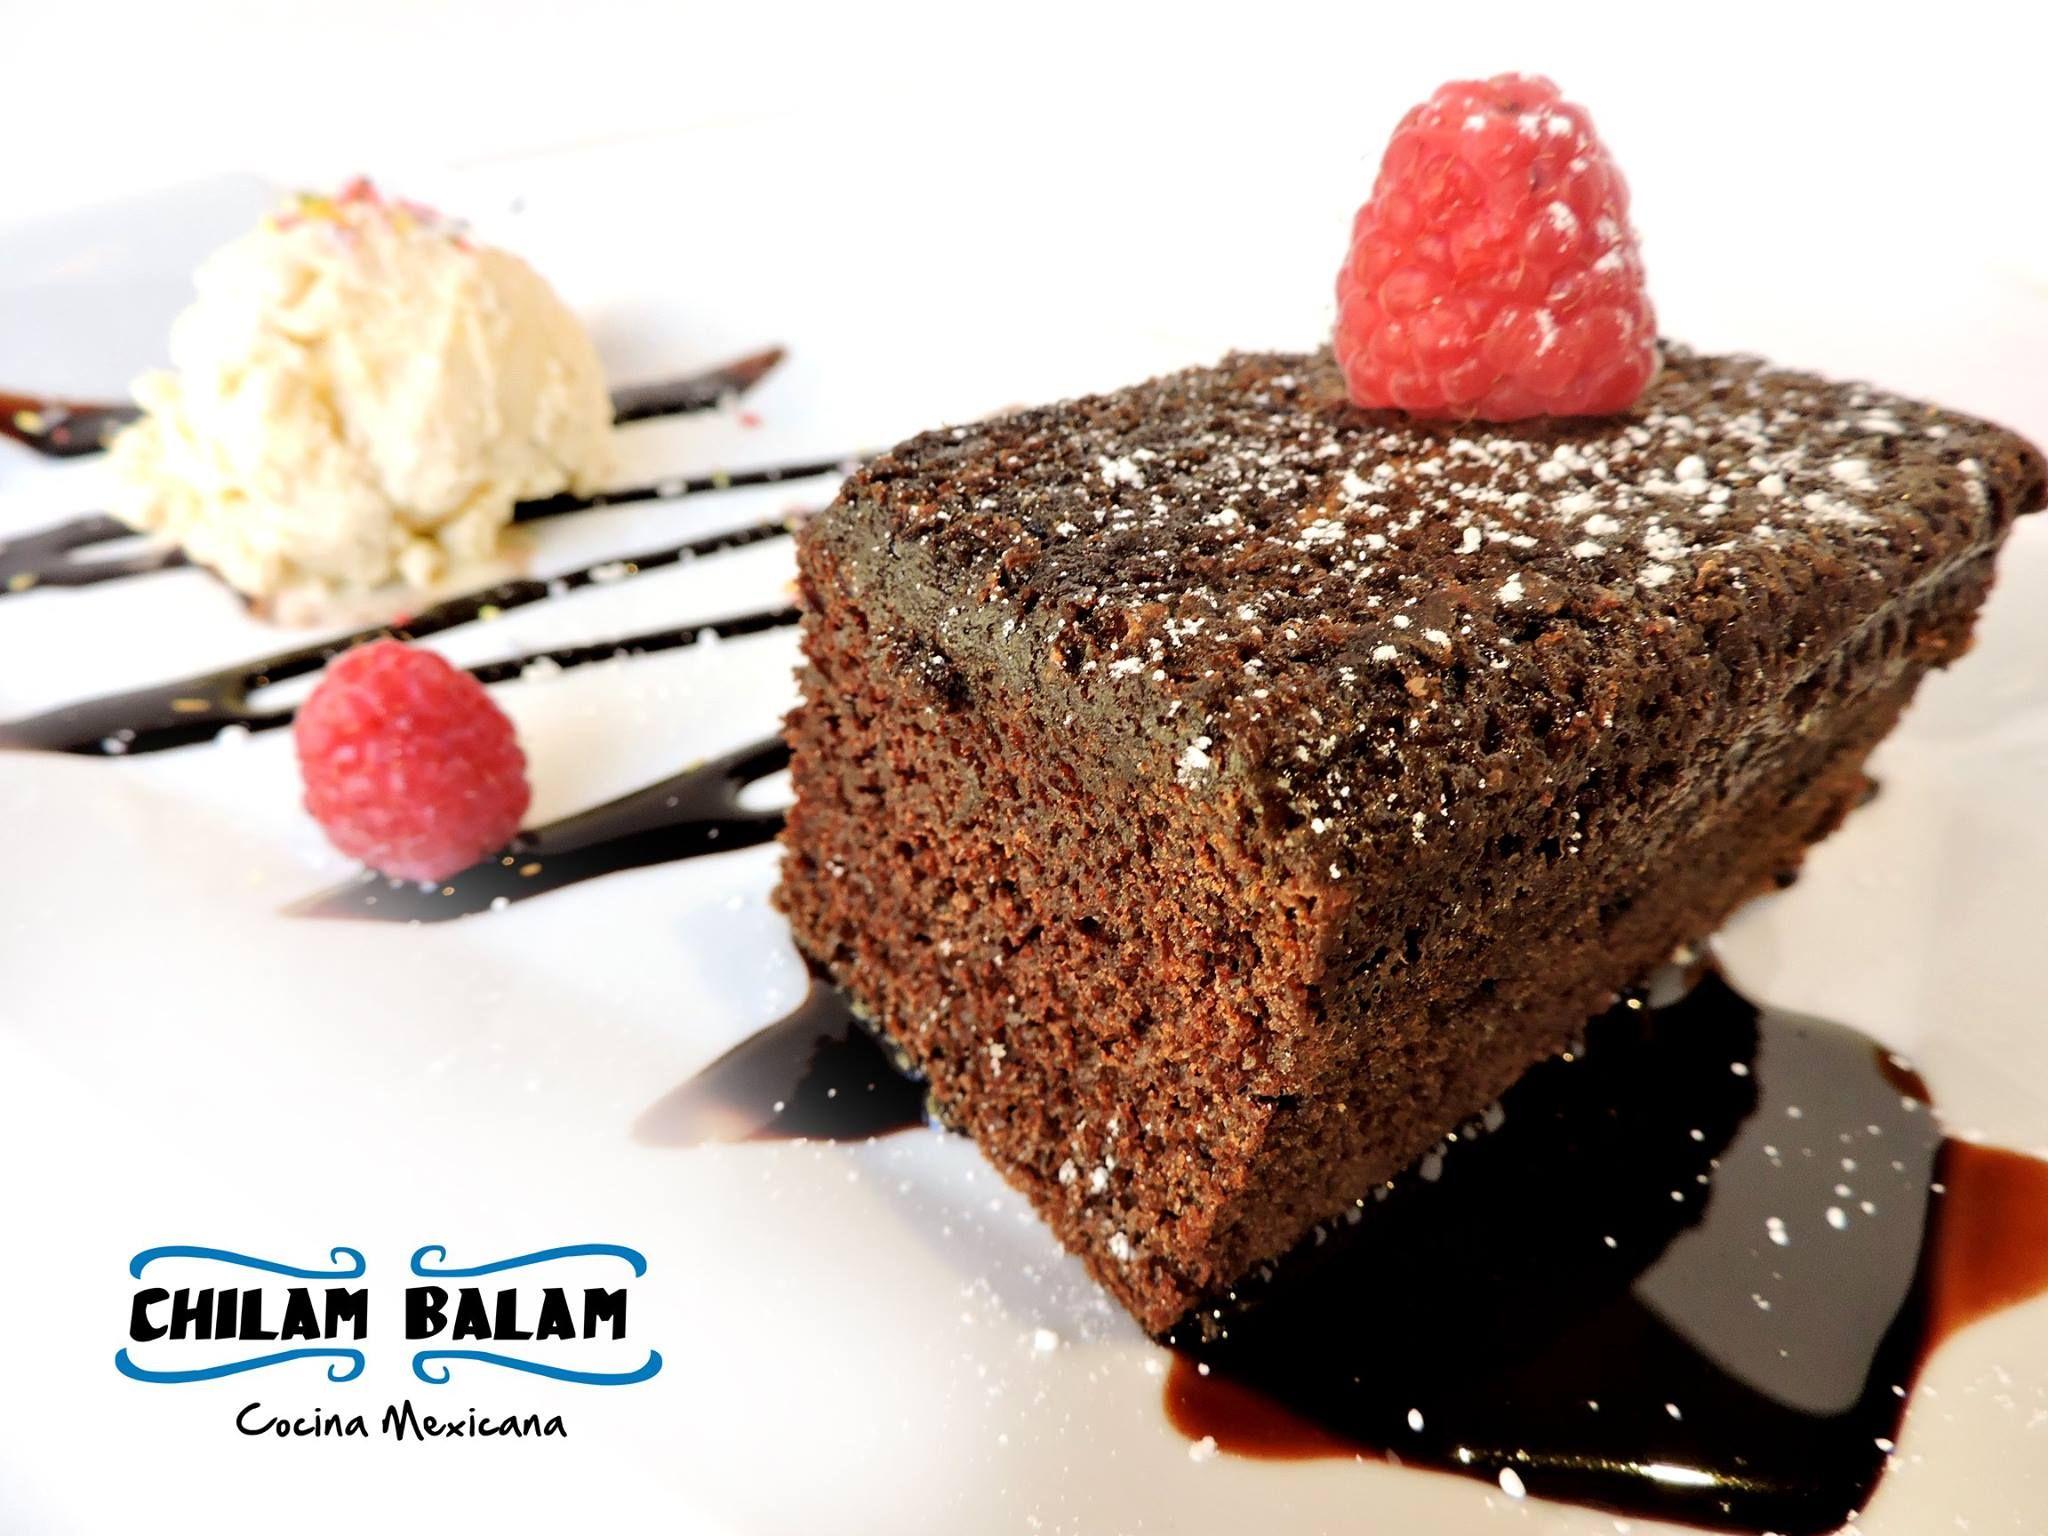 Postres: Nuestros platos de Chilam Balam